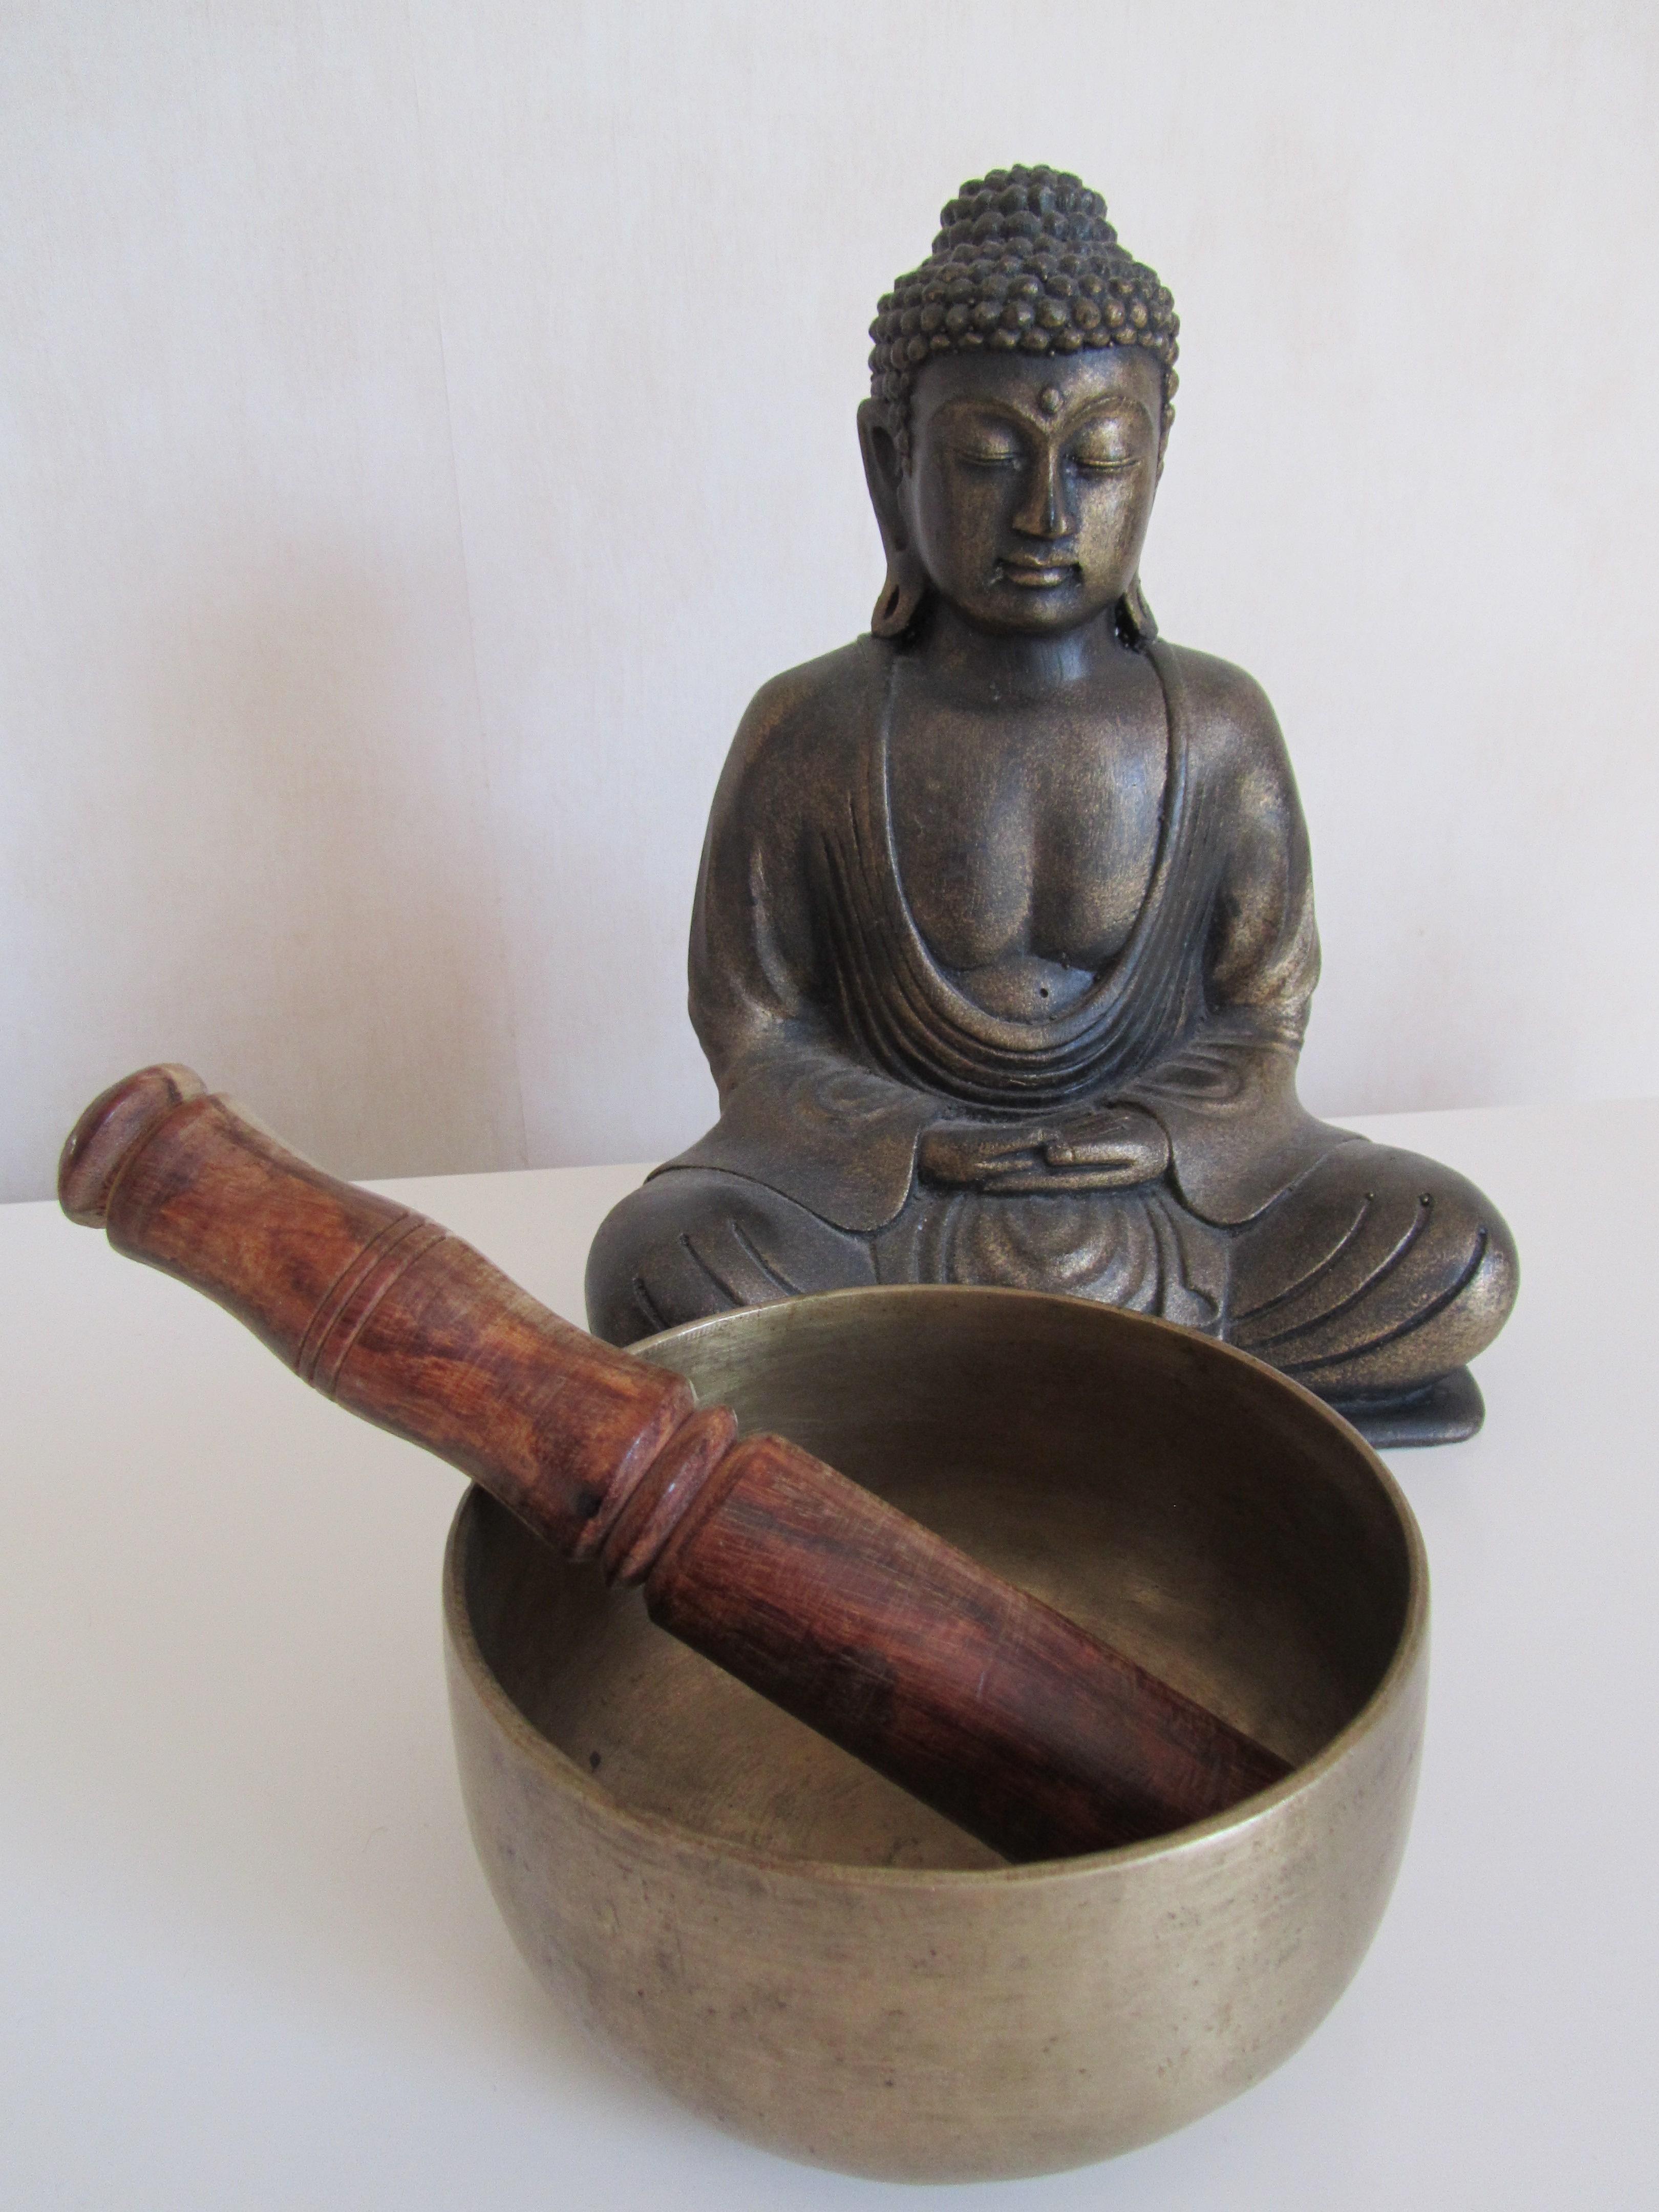 guérande la baule massage shiatsu reflexologie bien être cadeau zen 2